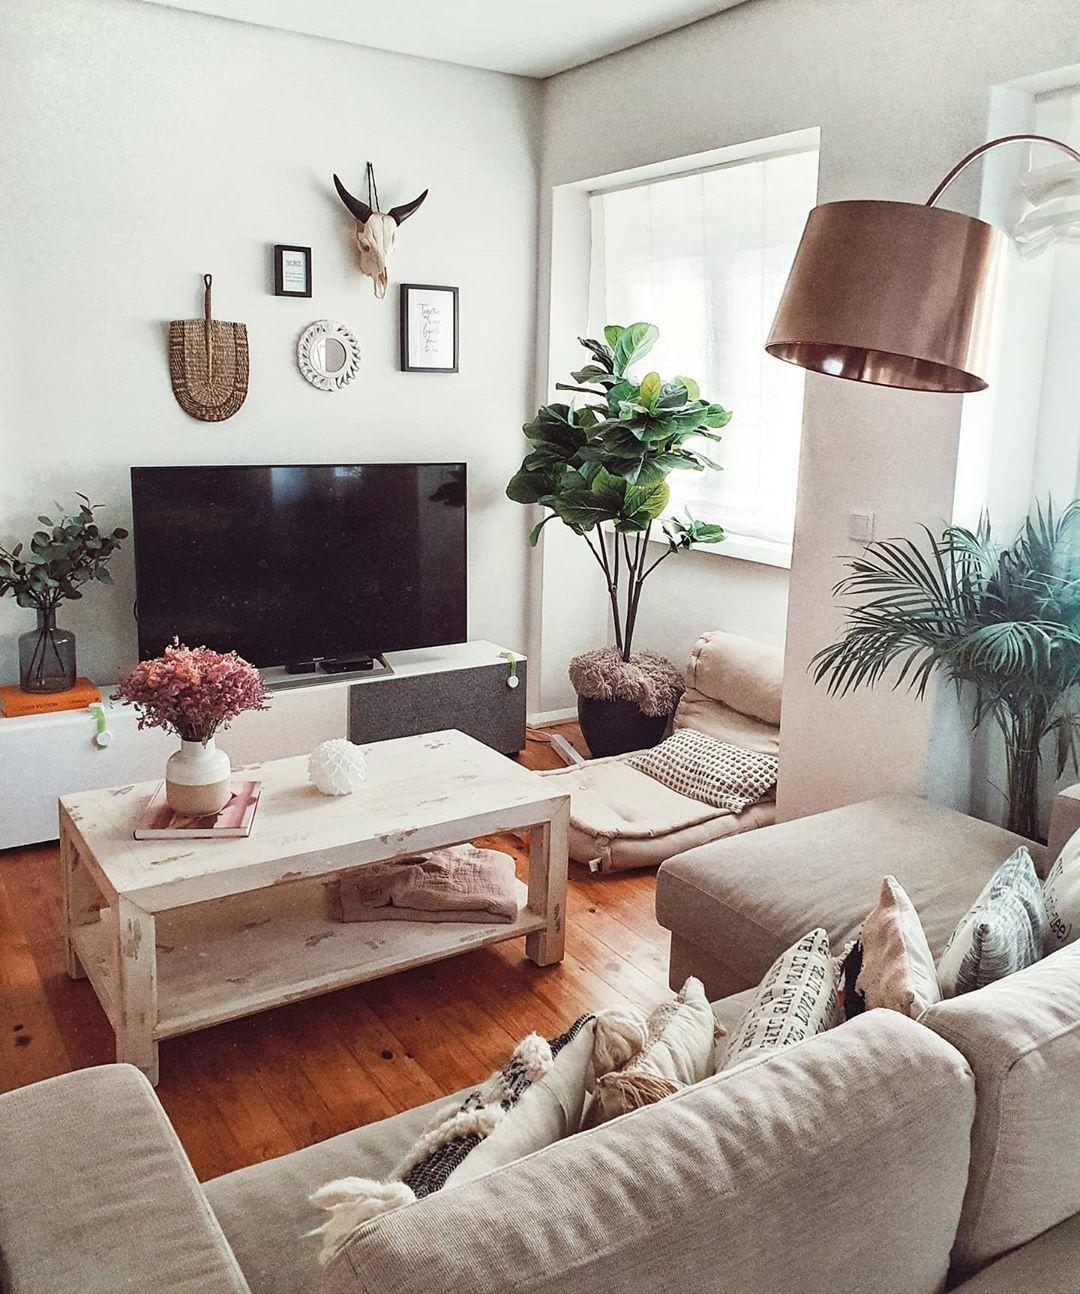 "𝐌𝐢𝐚 𝐑𝐨𝐬𝐞 on Instagram: ""Home sweet home ♡ #homedetails"""